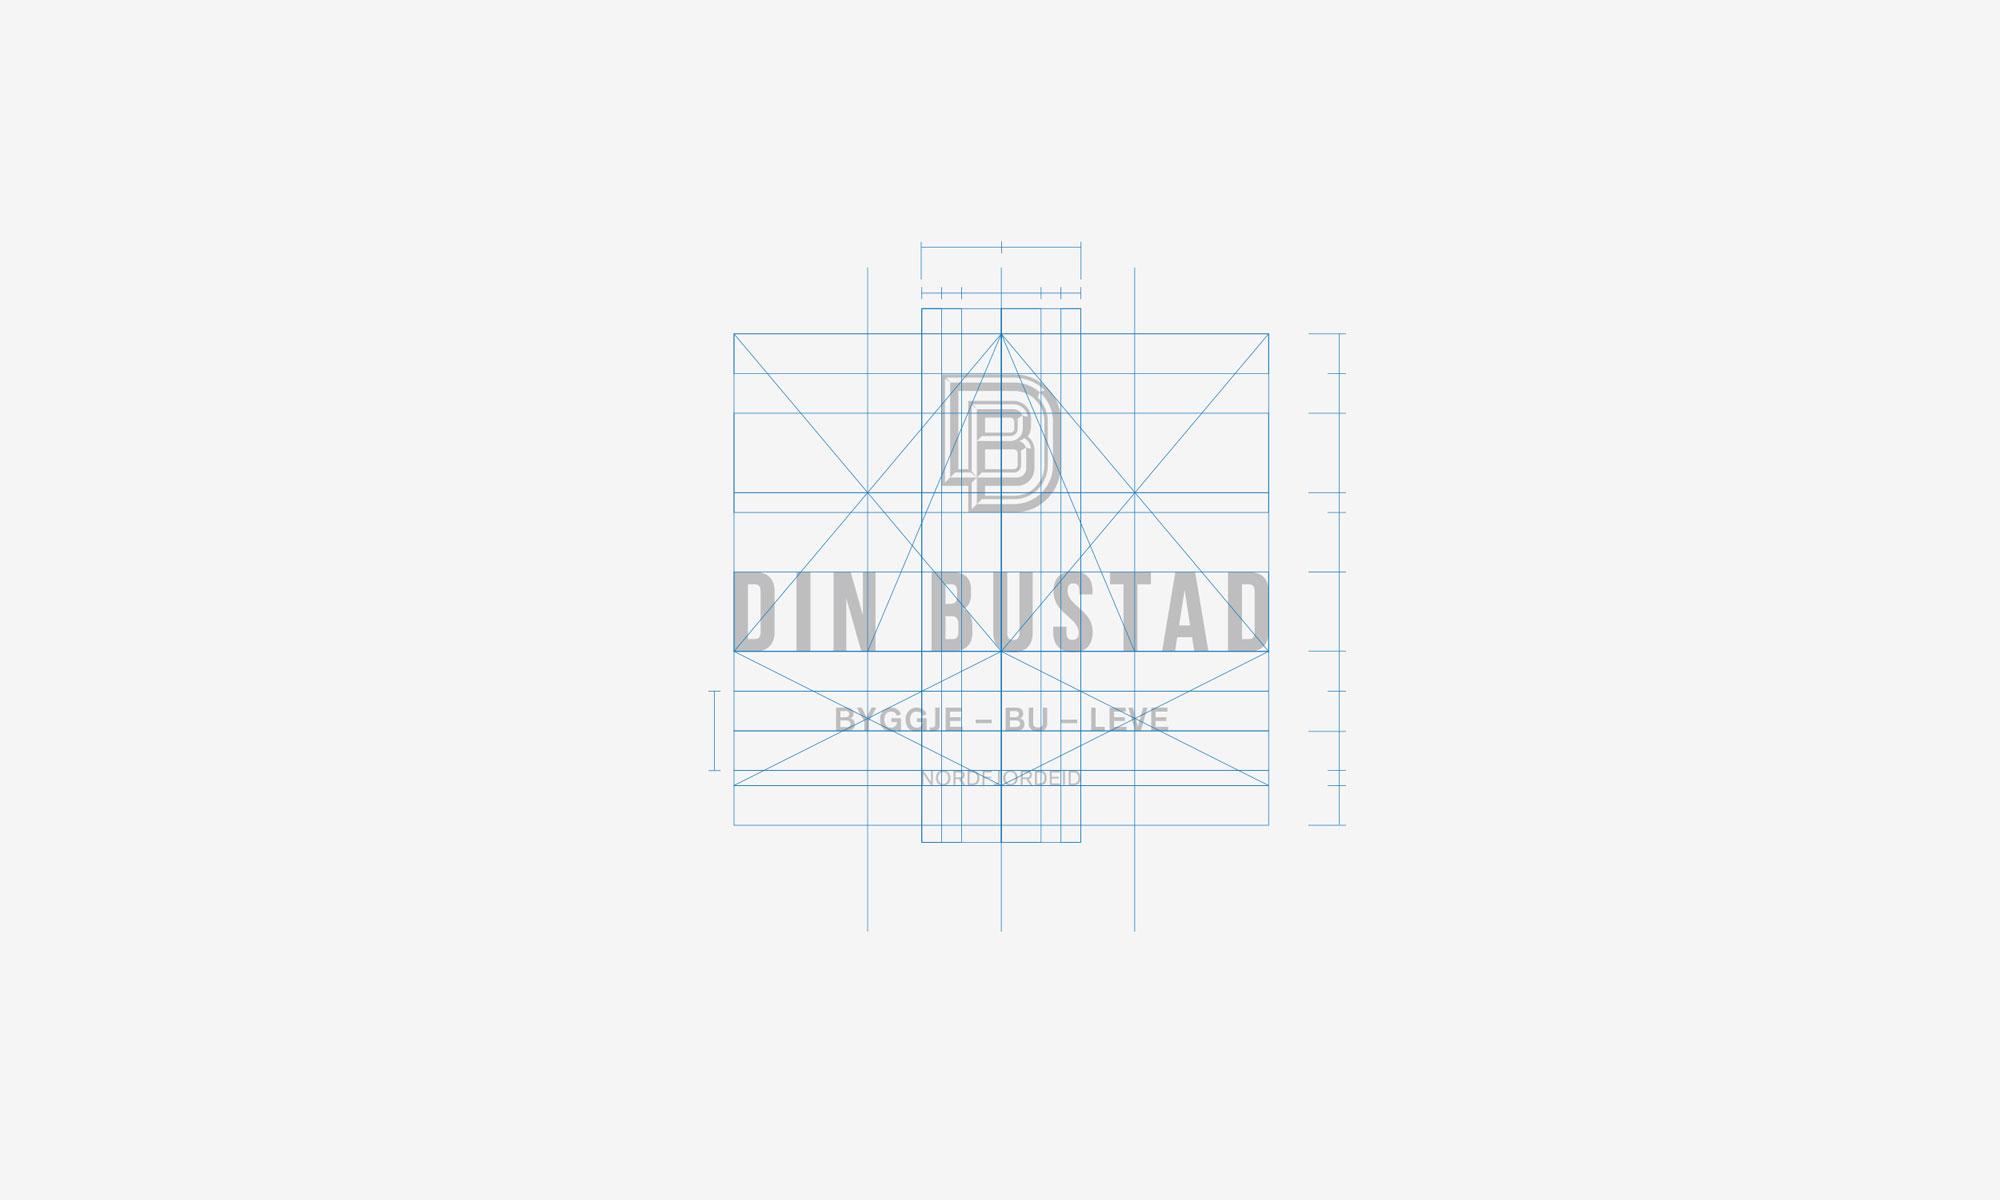 Din Bustad vertical logo construction